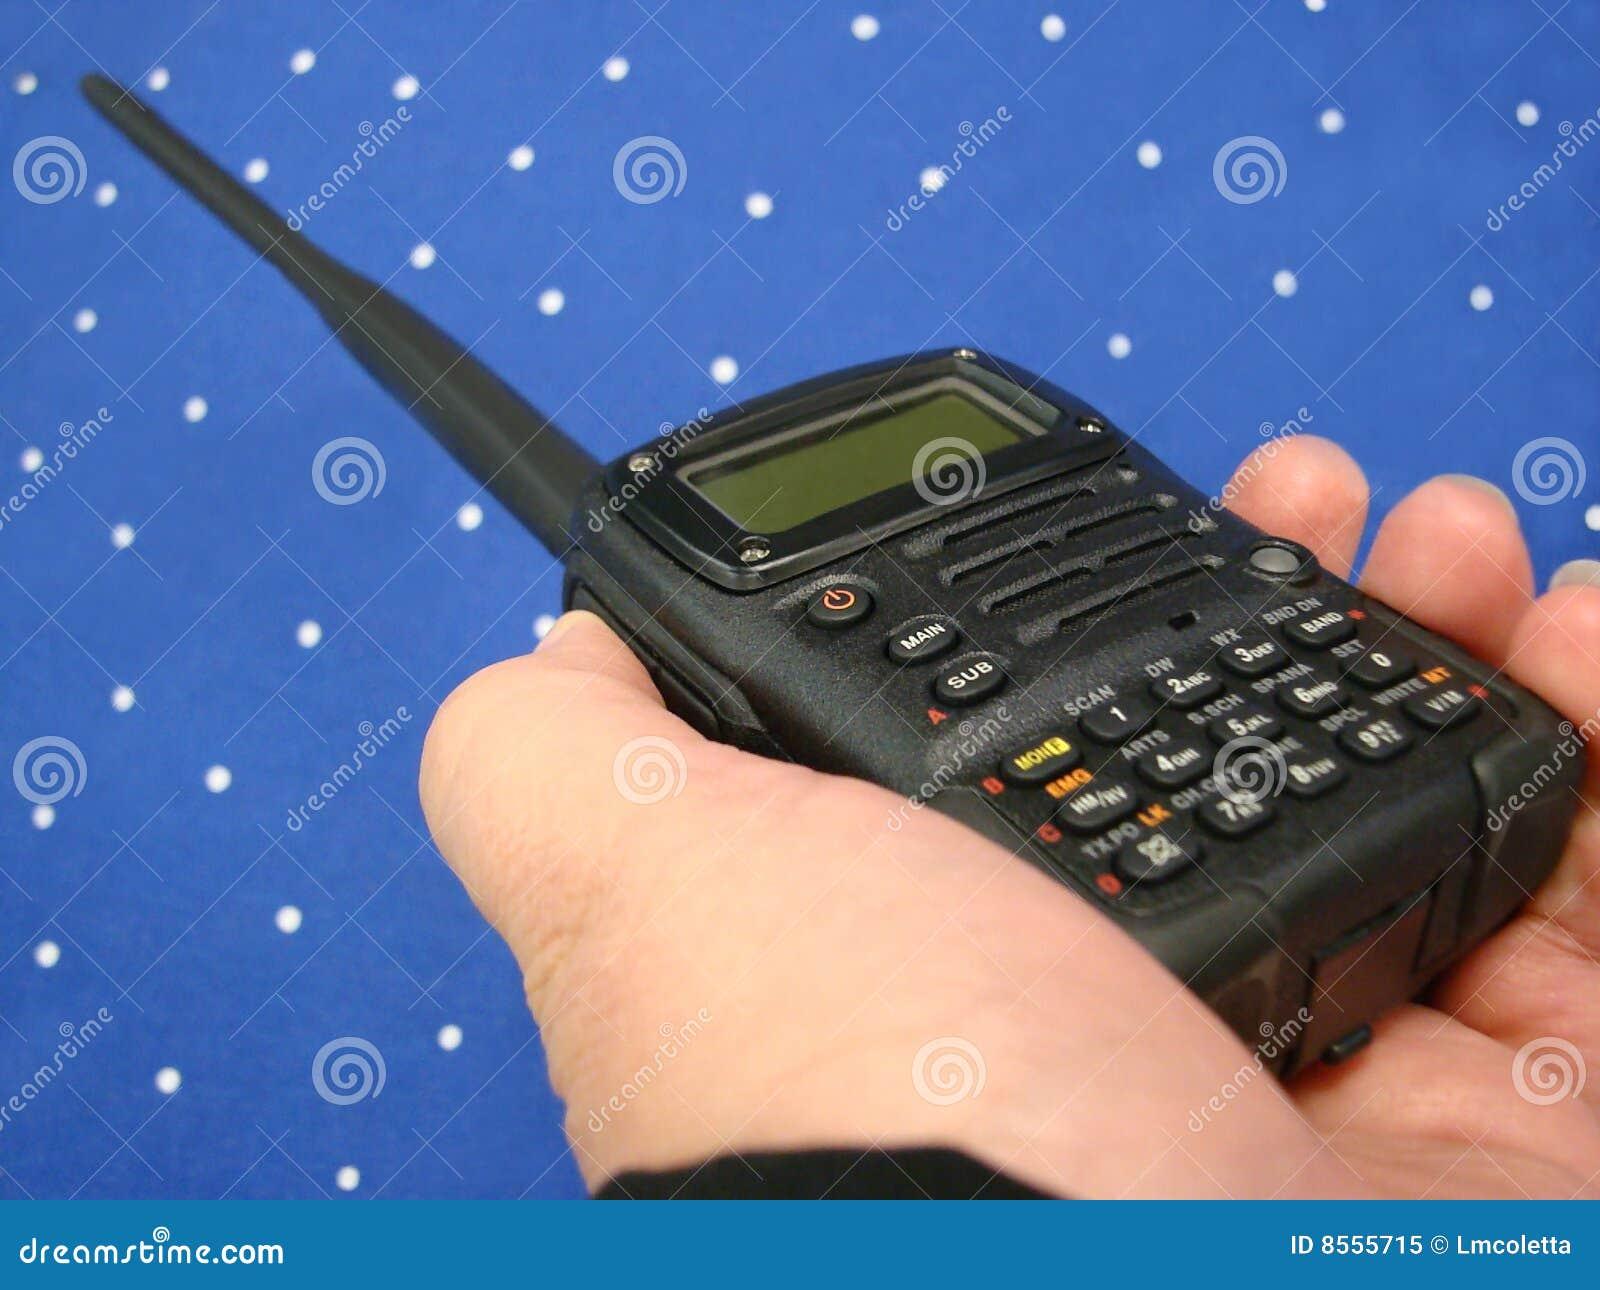 features of radio communication